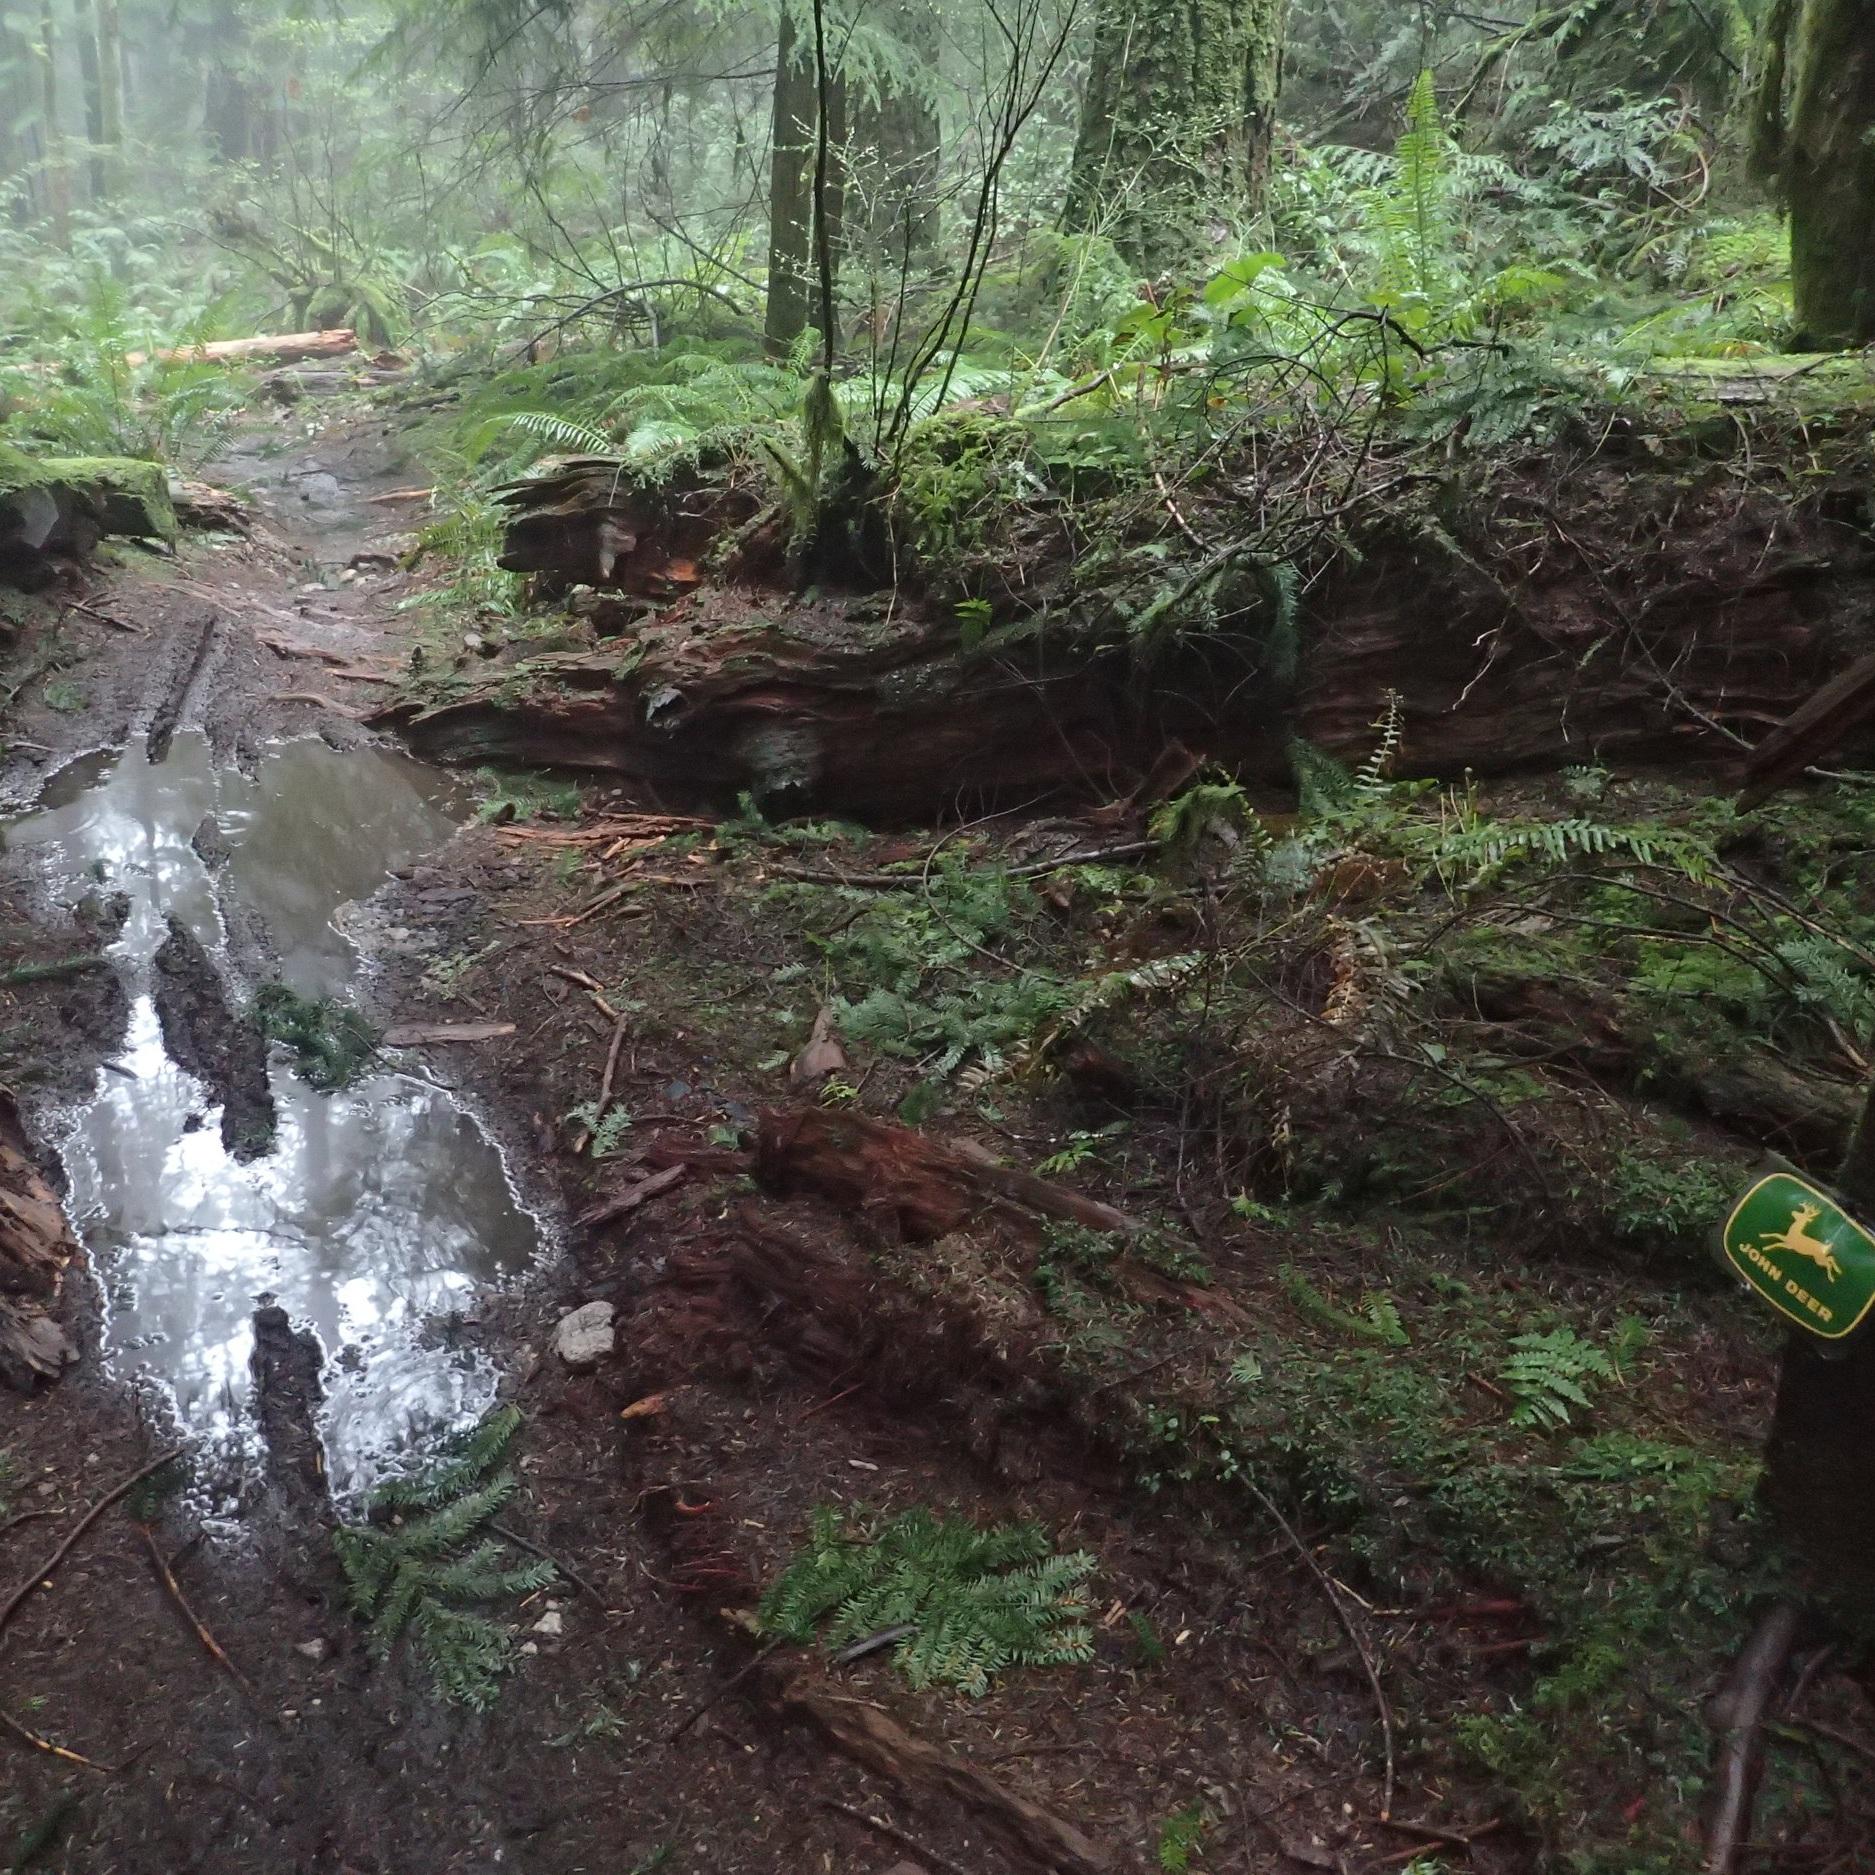 John Deer - No Drainage